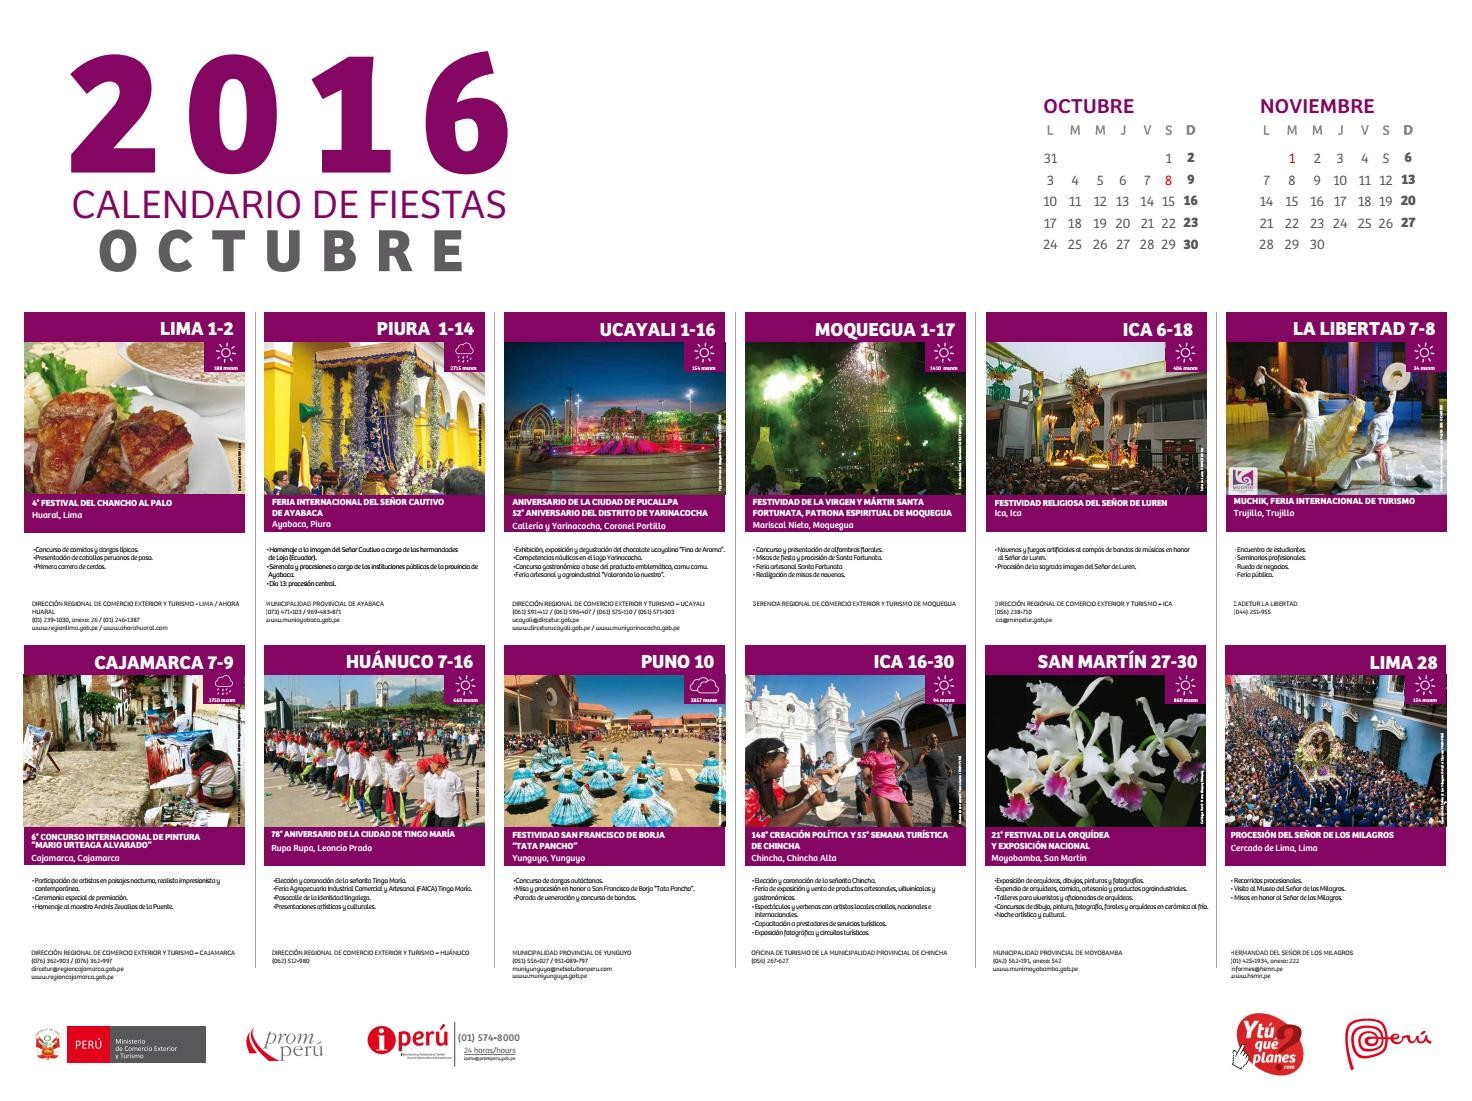 peru calendar octubre 2016